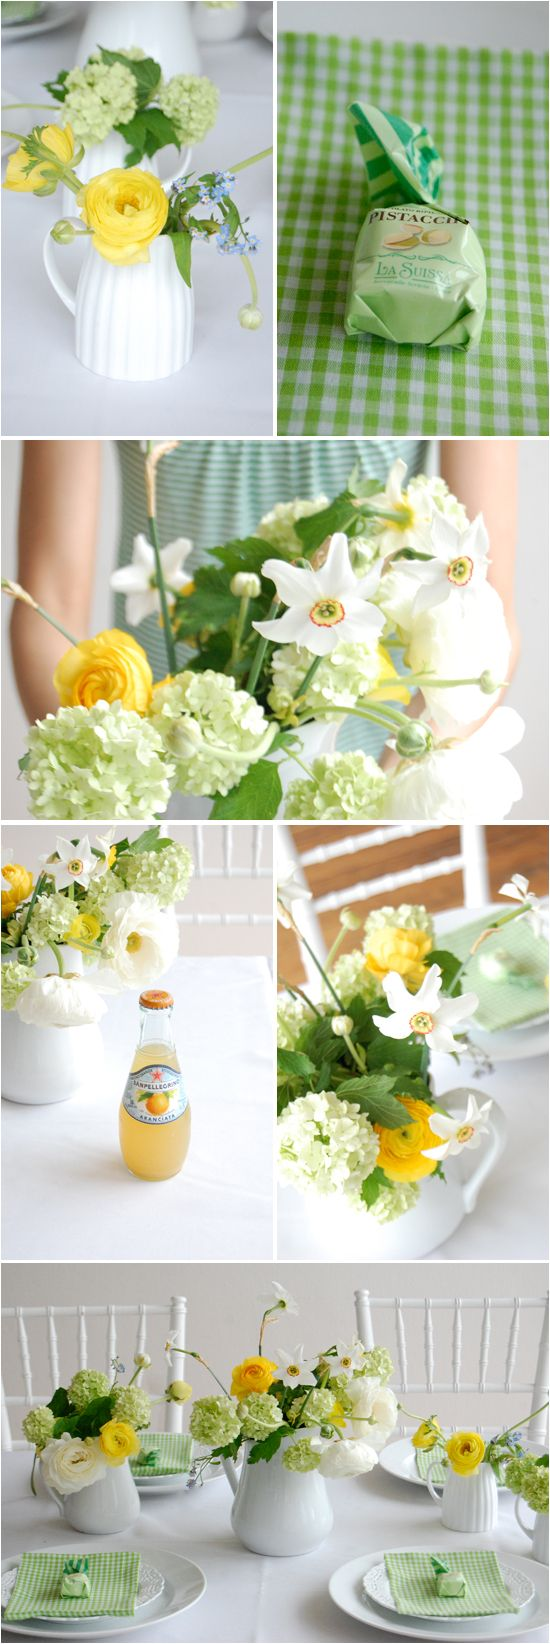 1950's wedding decorations november 2018  best Green Wedding Inspiration images on Pinterest  Green